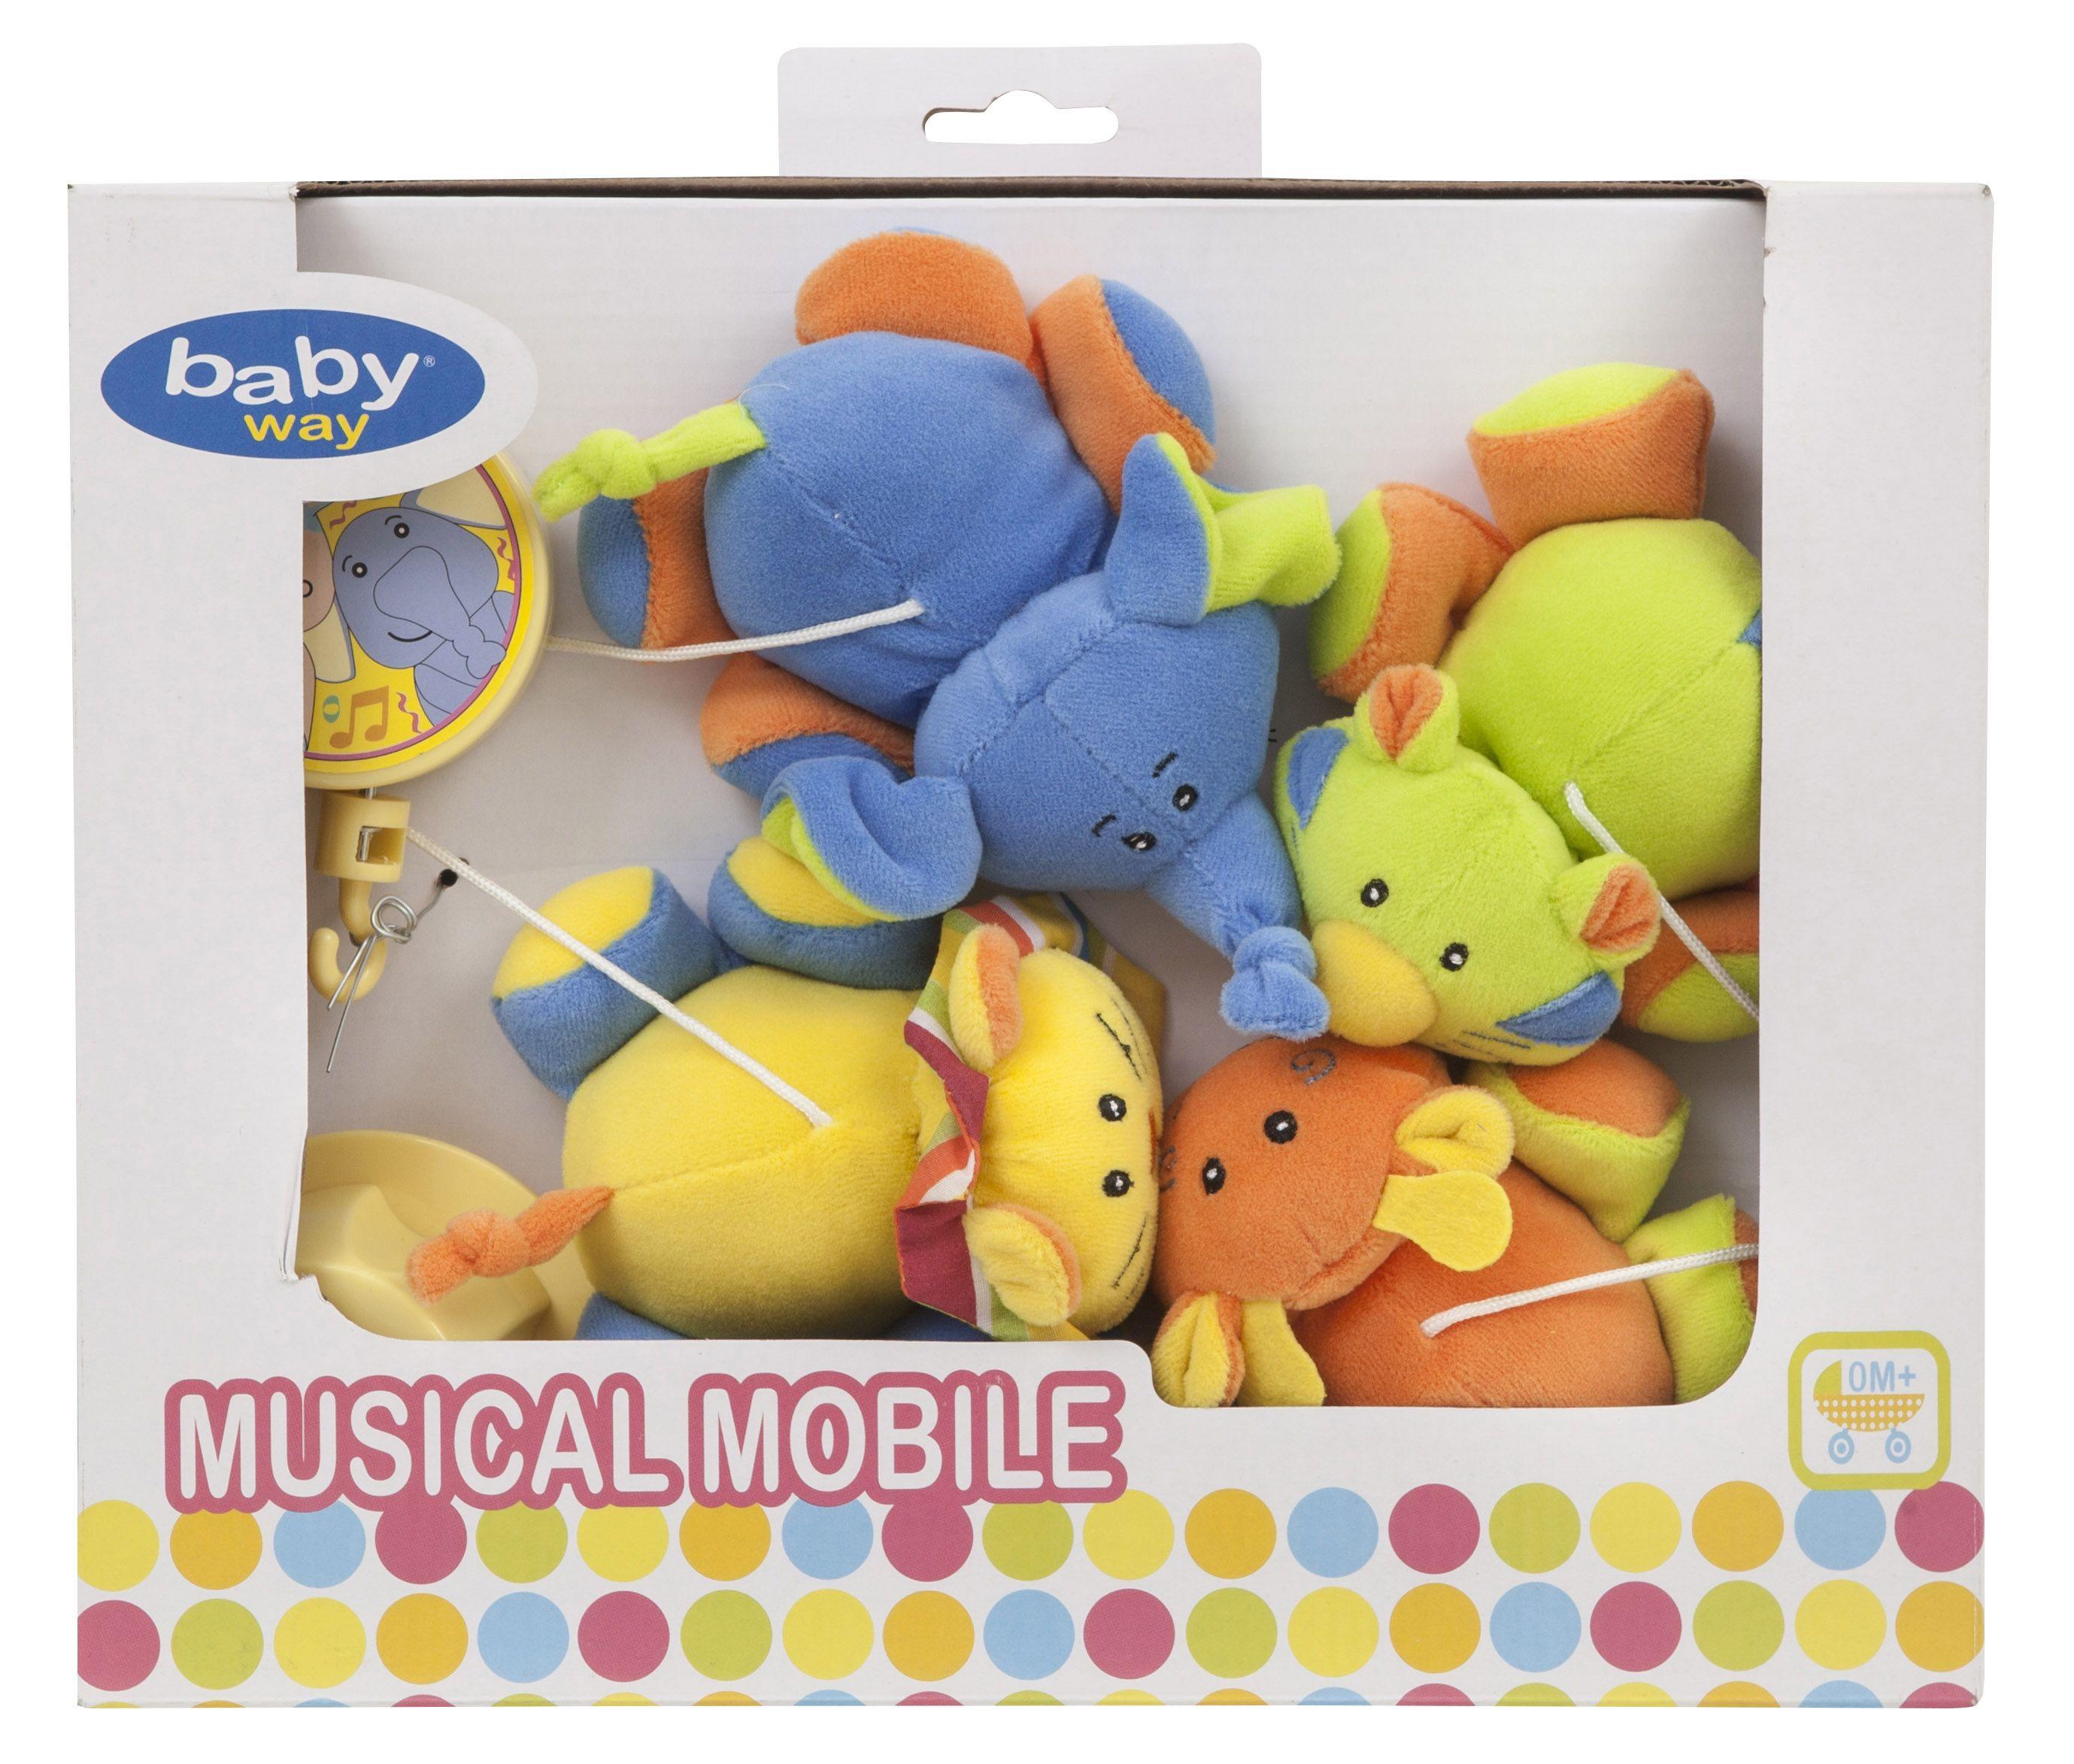 Movil musical